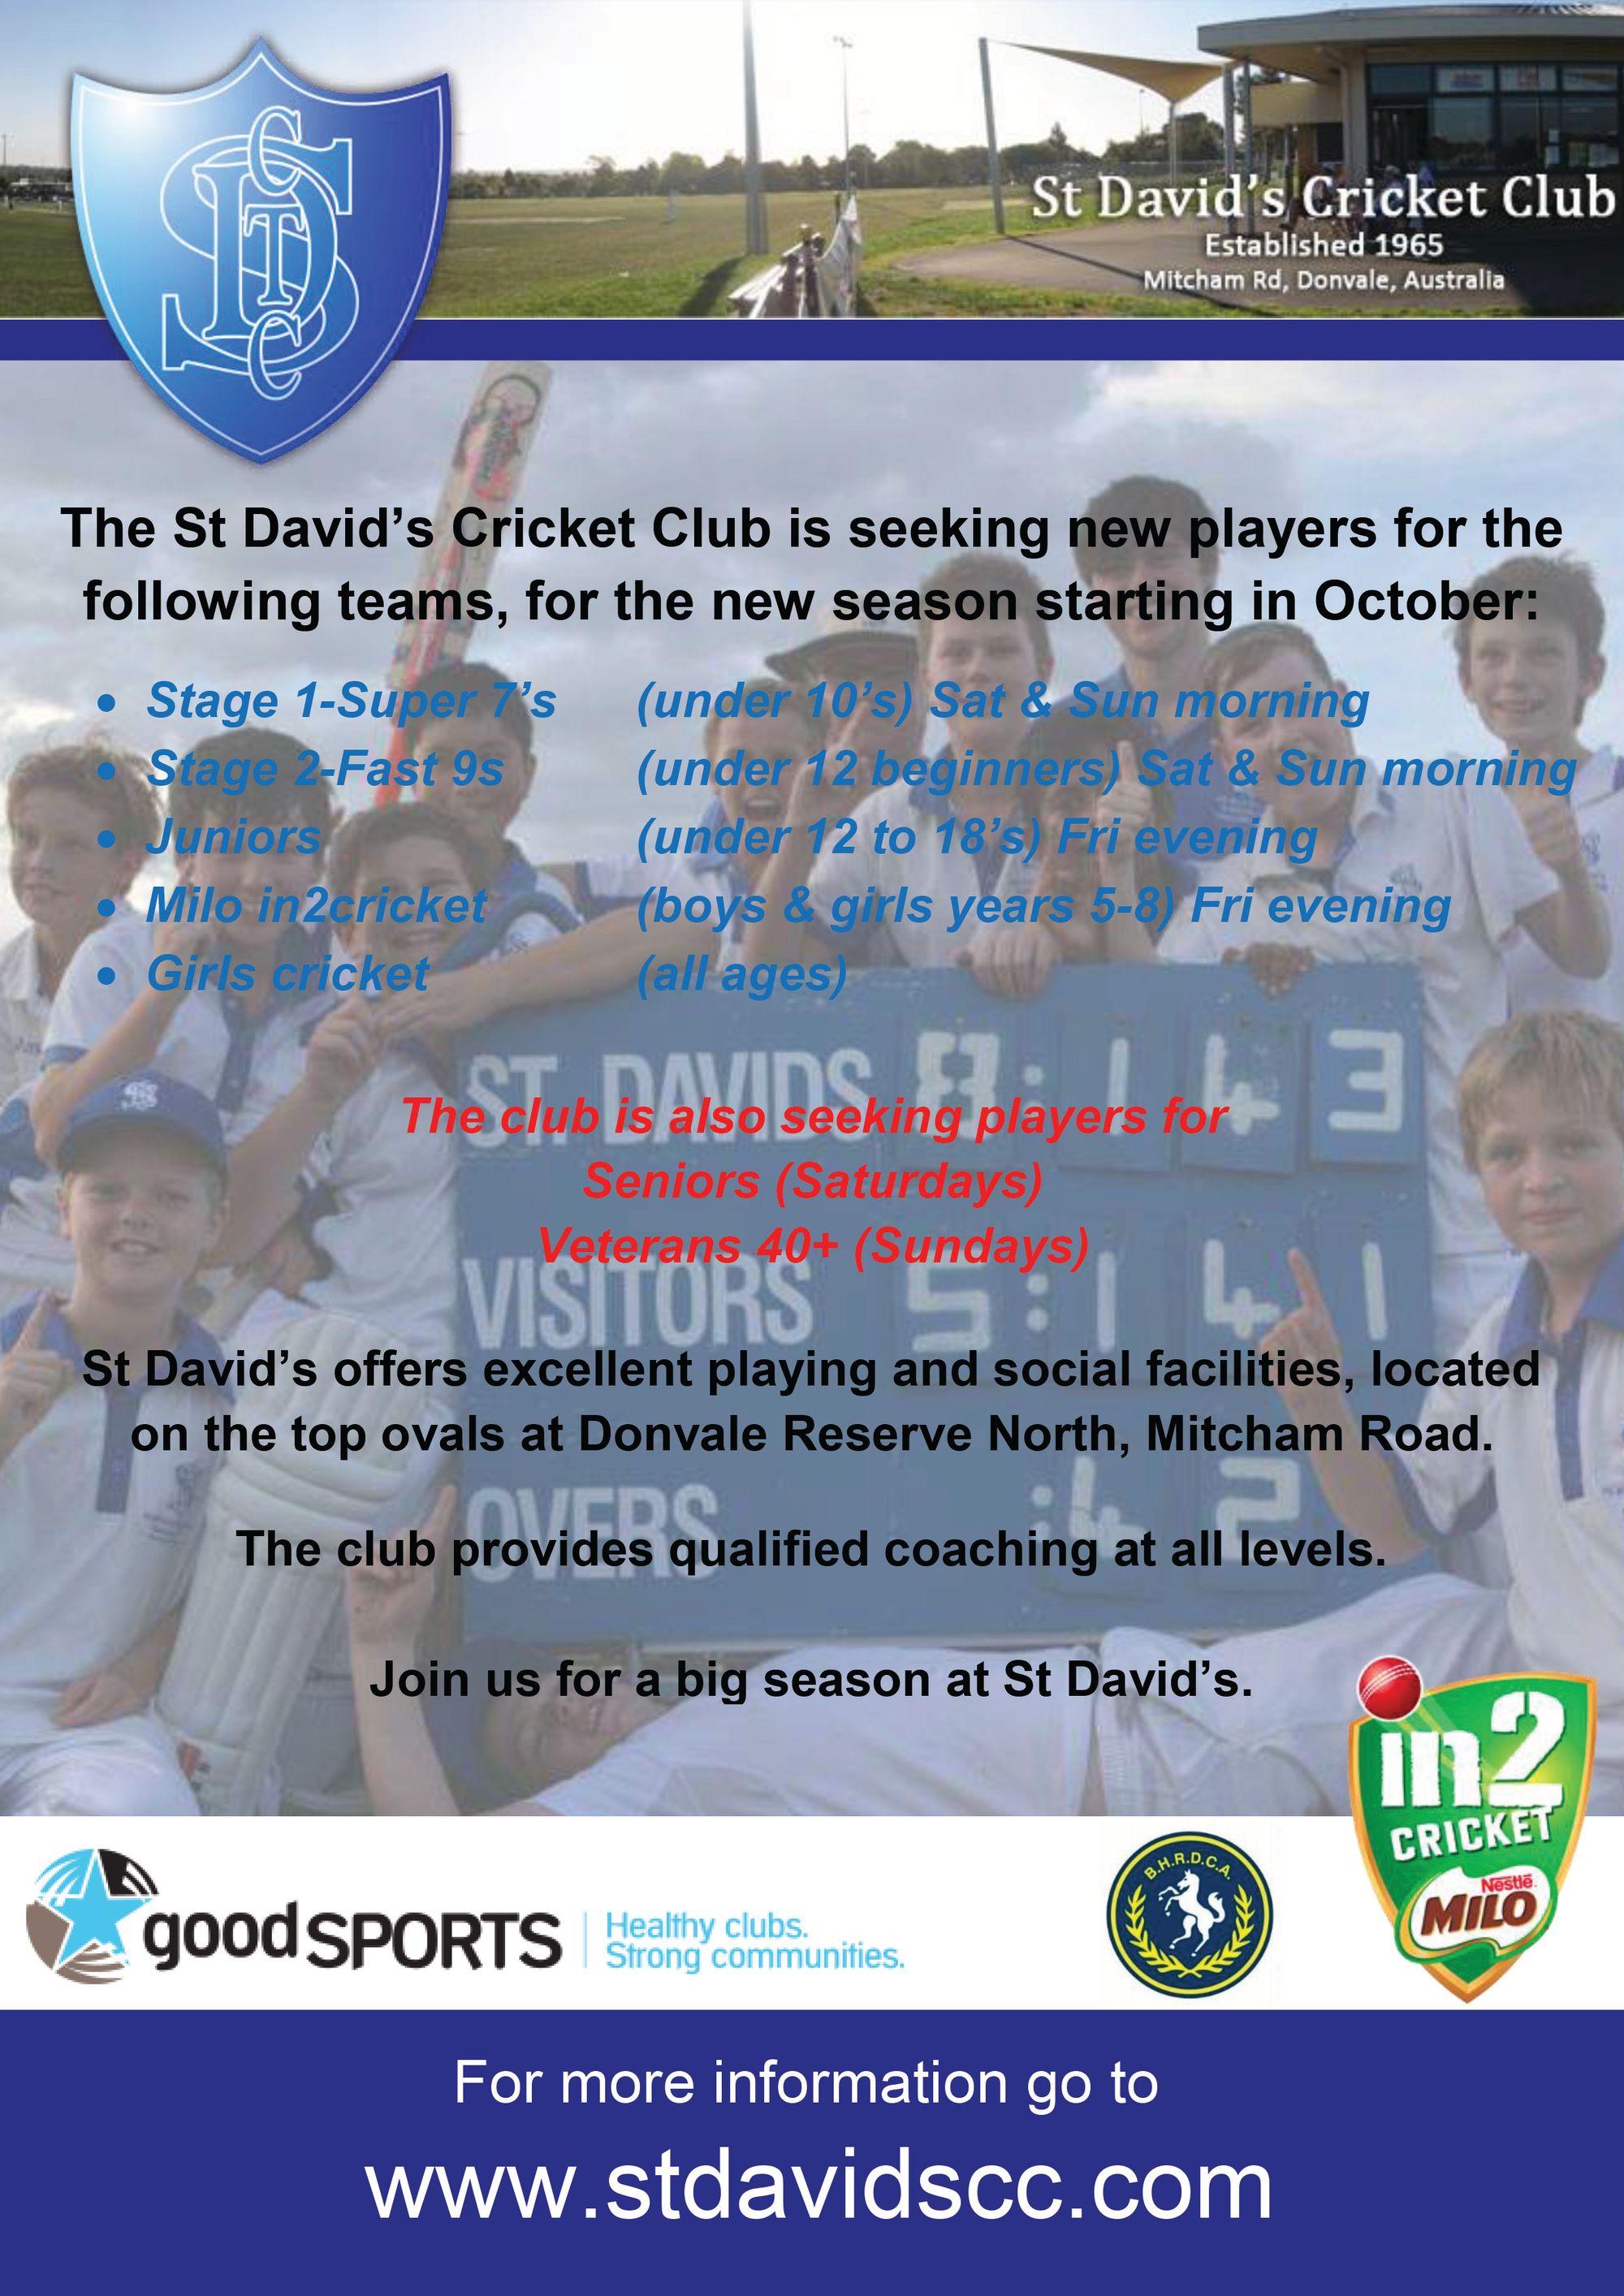 St Davids Cricket Club